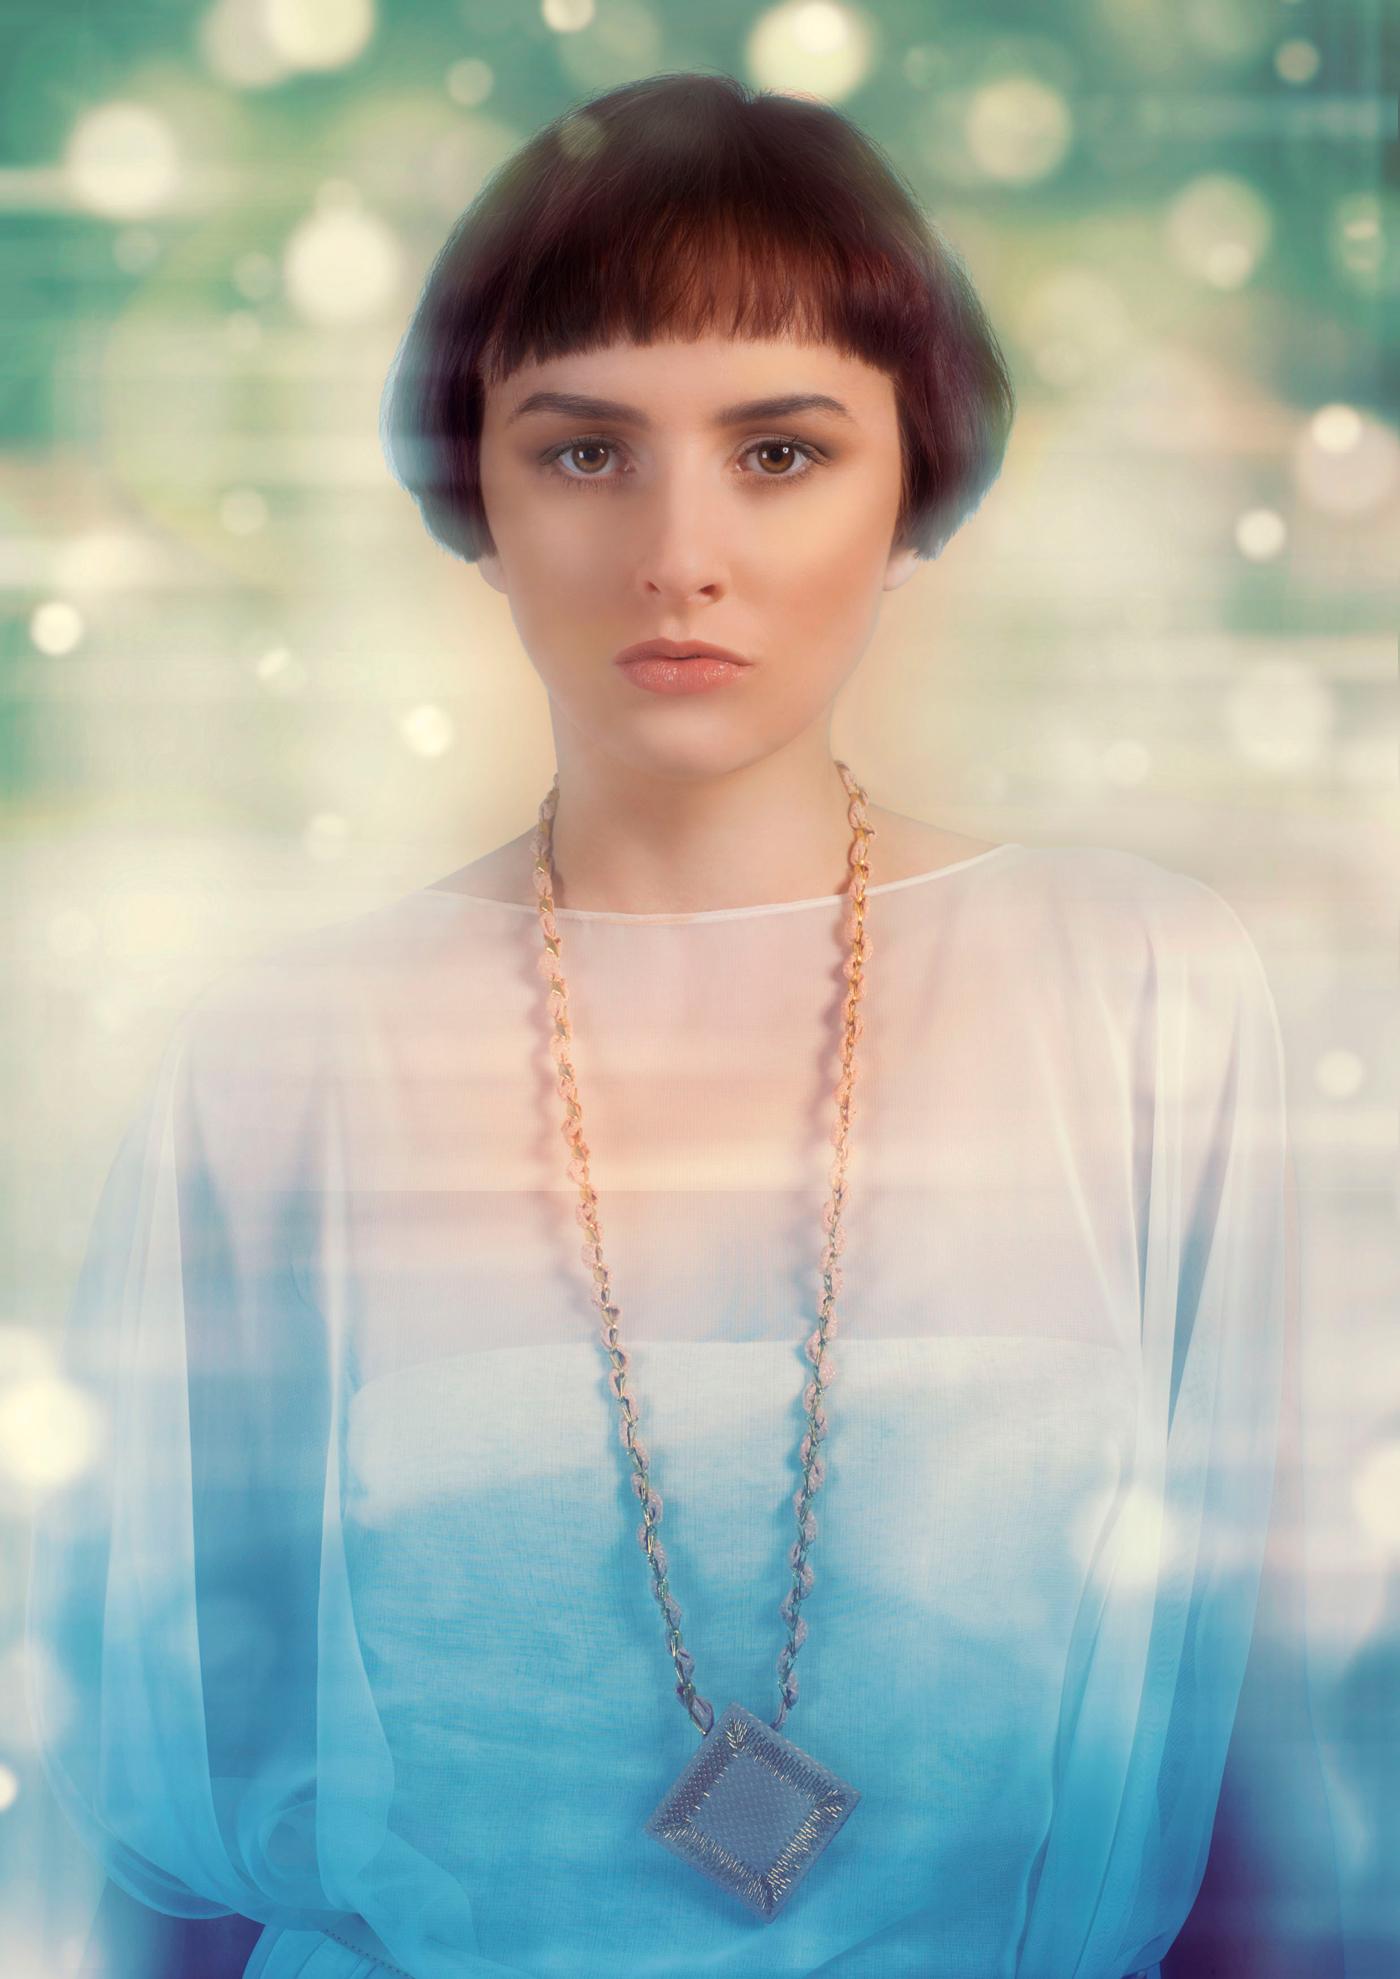 https://gordonscott.photography/wp-content/uploads/2018/07/Eliza-Tate-Creative-Portraits-1.jpg